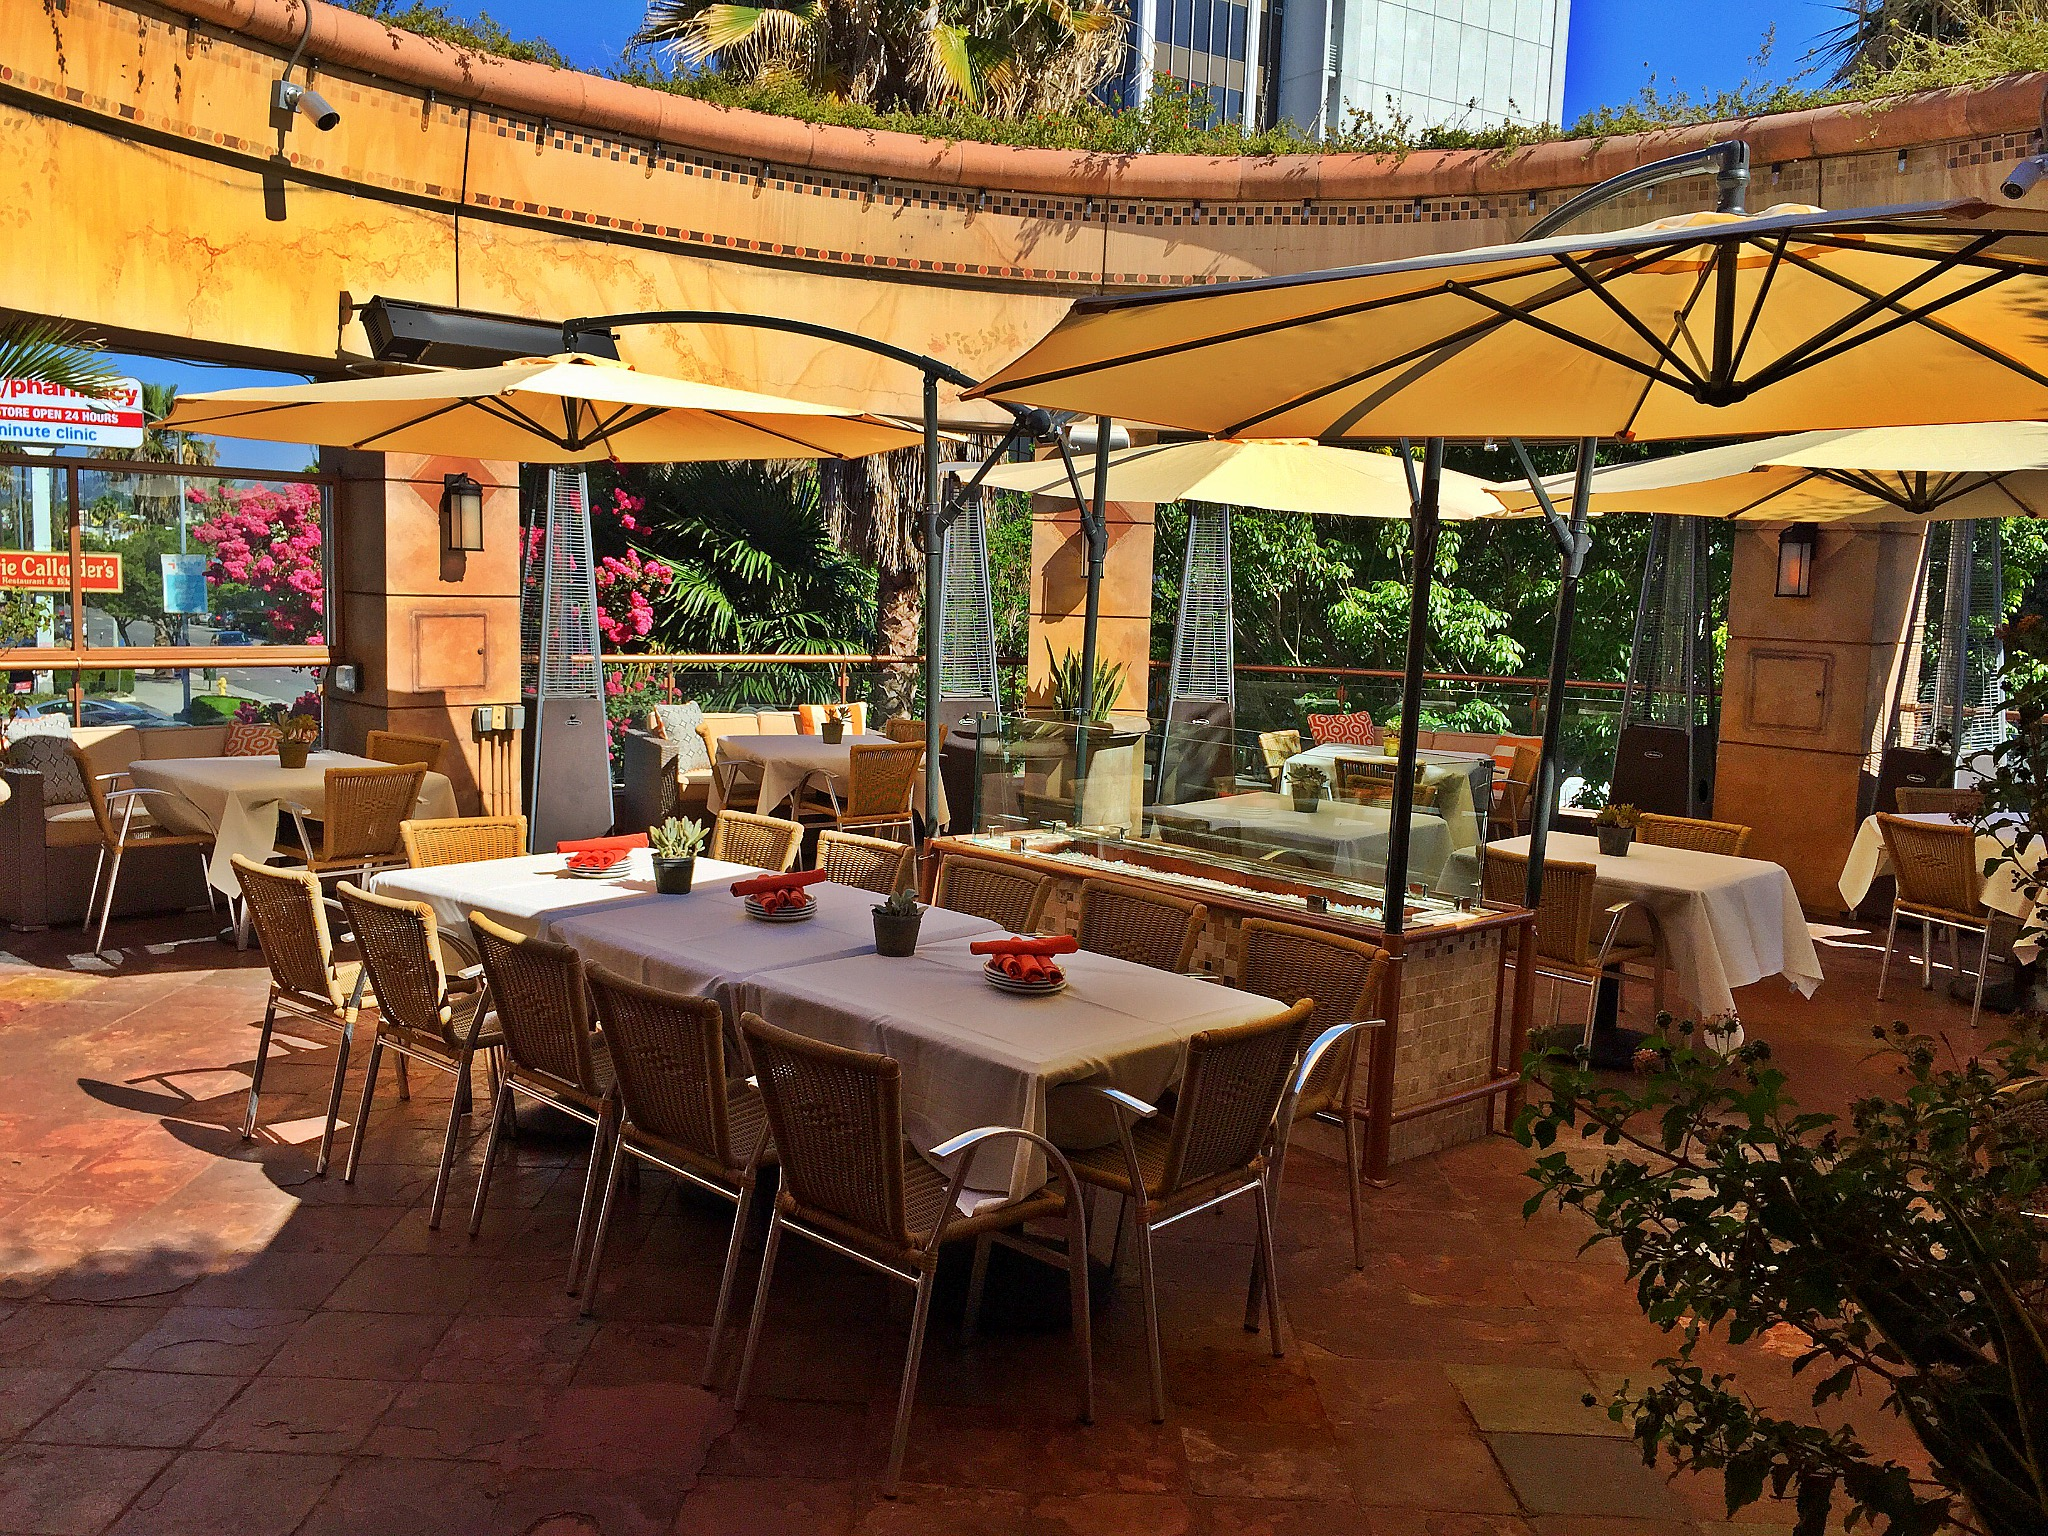 Anejo Cantina And Grill 14755 Ventura Blvd Sherman Oaks